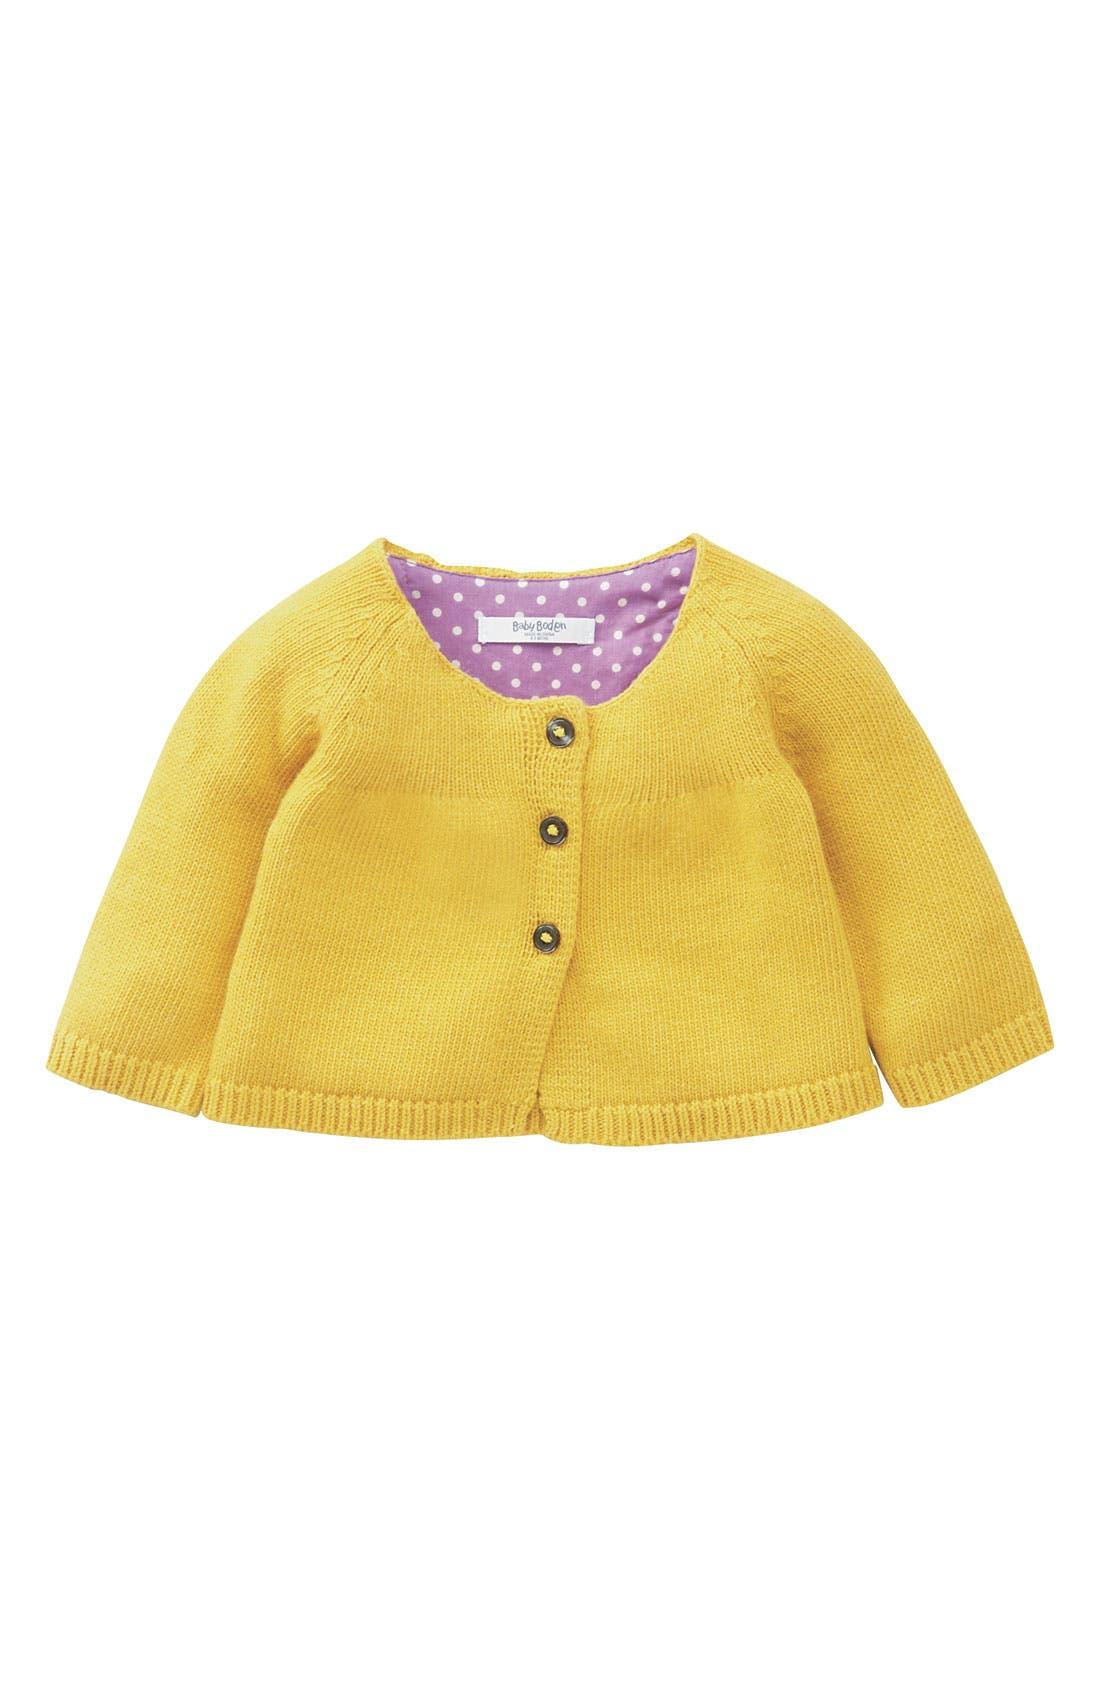 Alternate Image 1 Selected - Mini Boden Babydoll Cardigan (Infant)